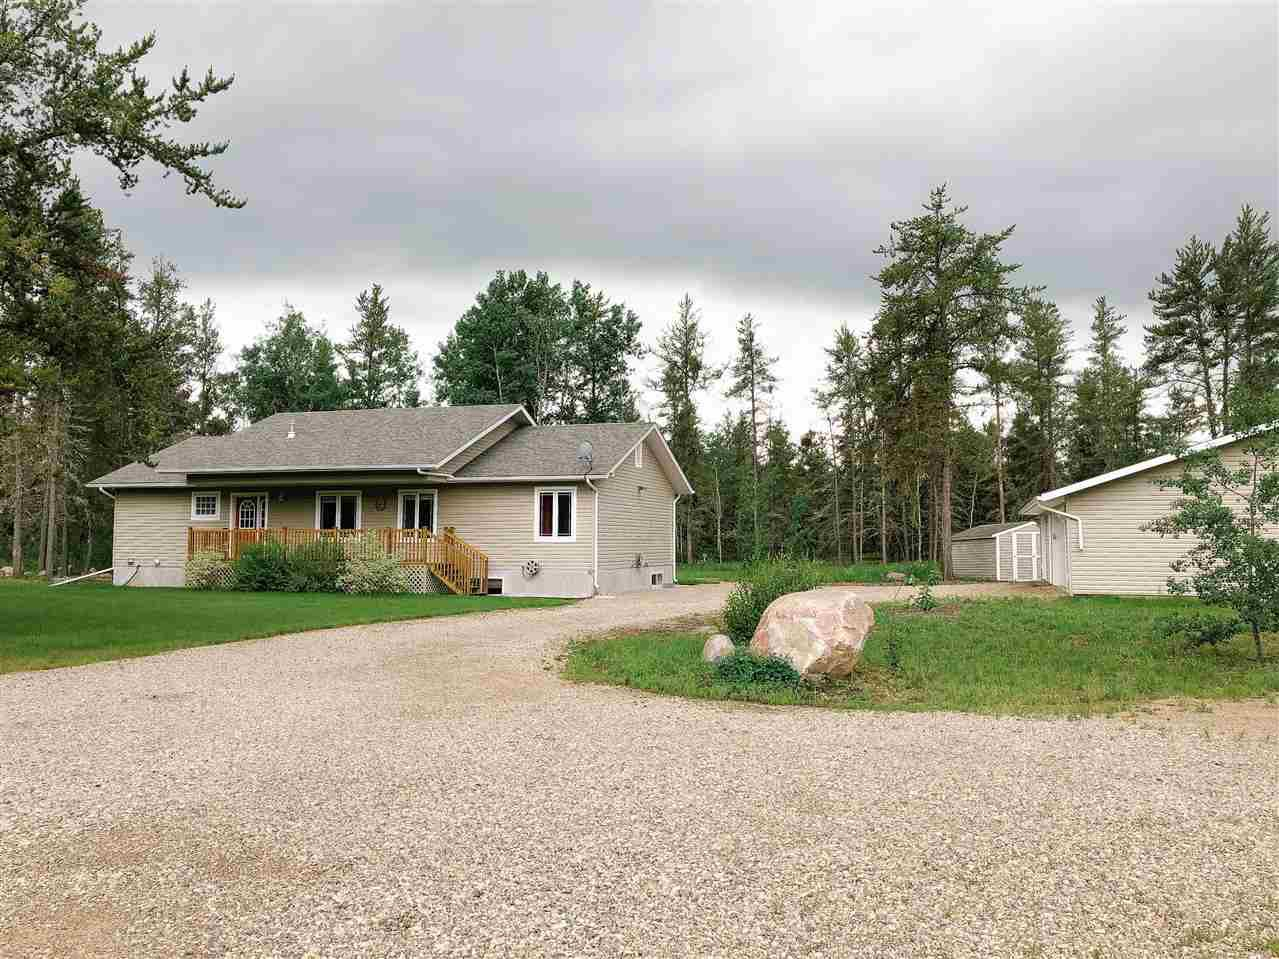 Main Photo: 63319 Rge Rd 435: Rural Bonnyville M.D. House for sale : MLS®# E4162432